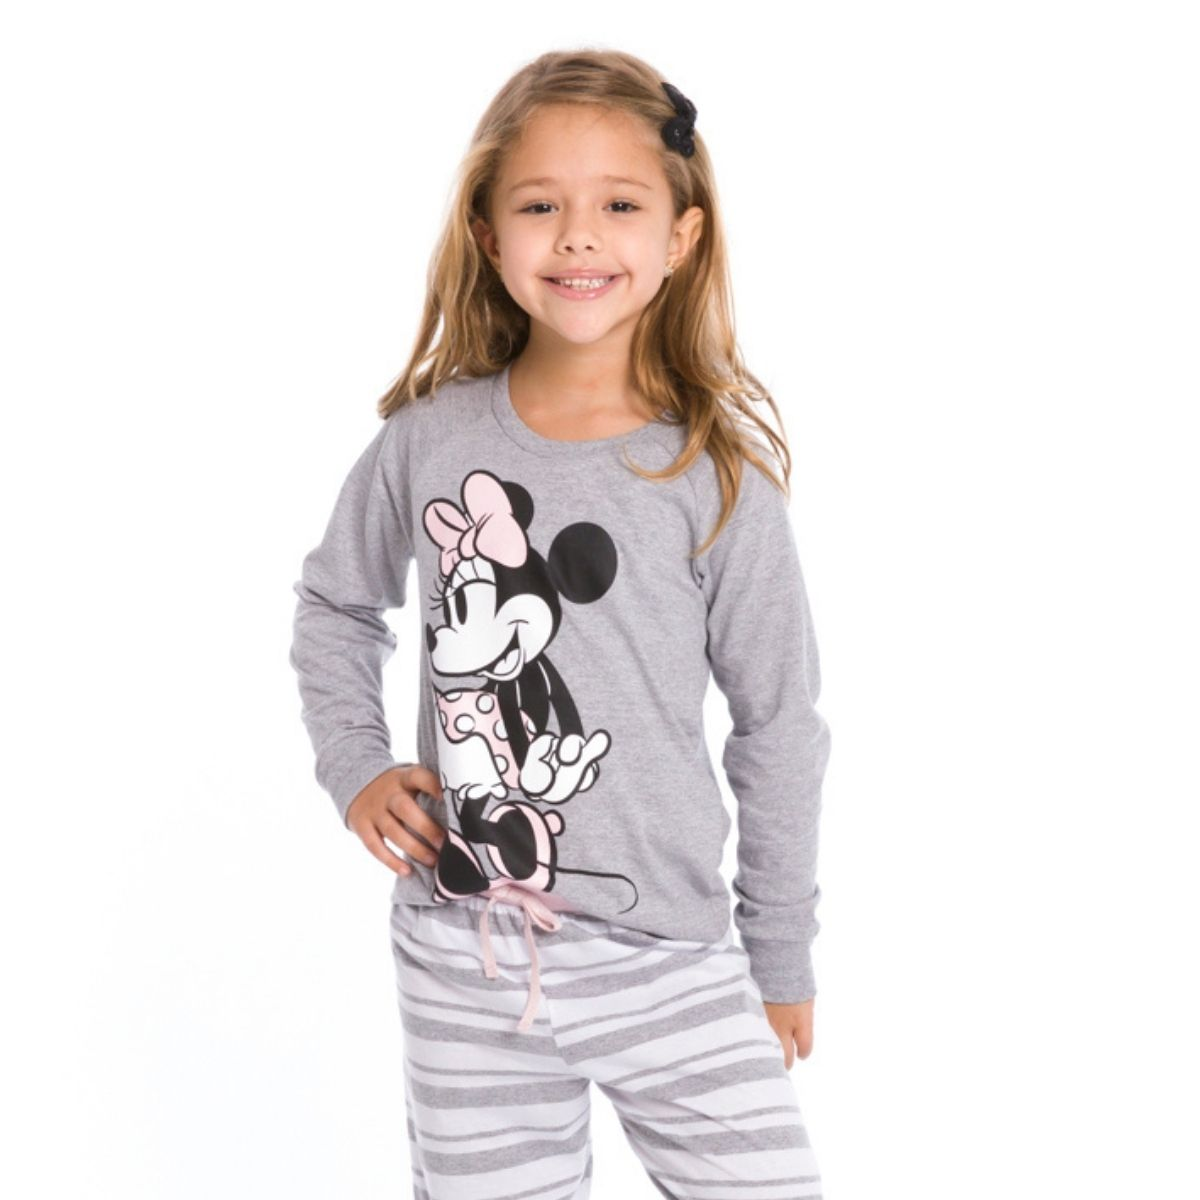 Pijama infantil menina listrado minnie quentinho inverno